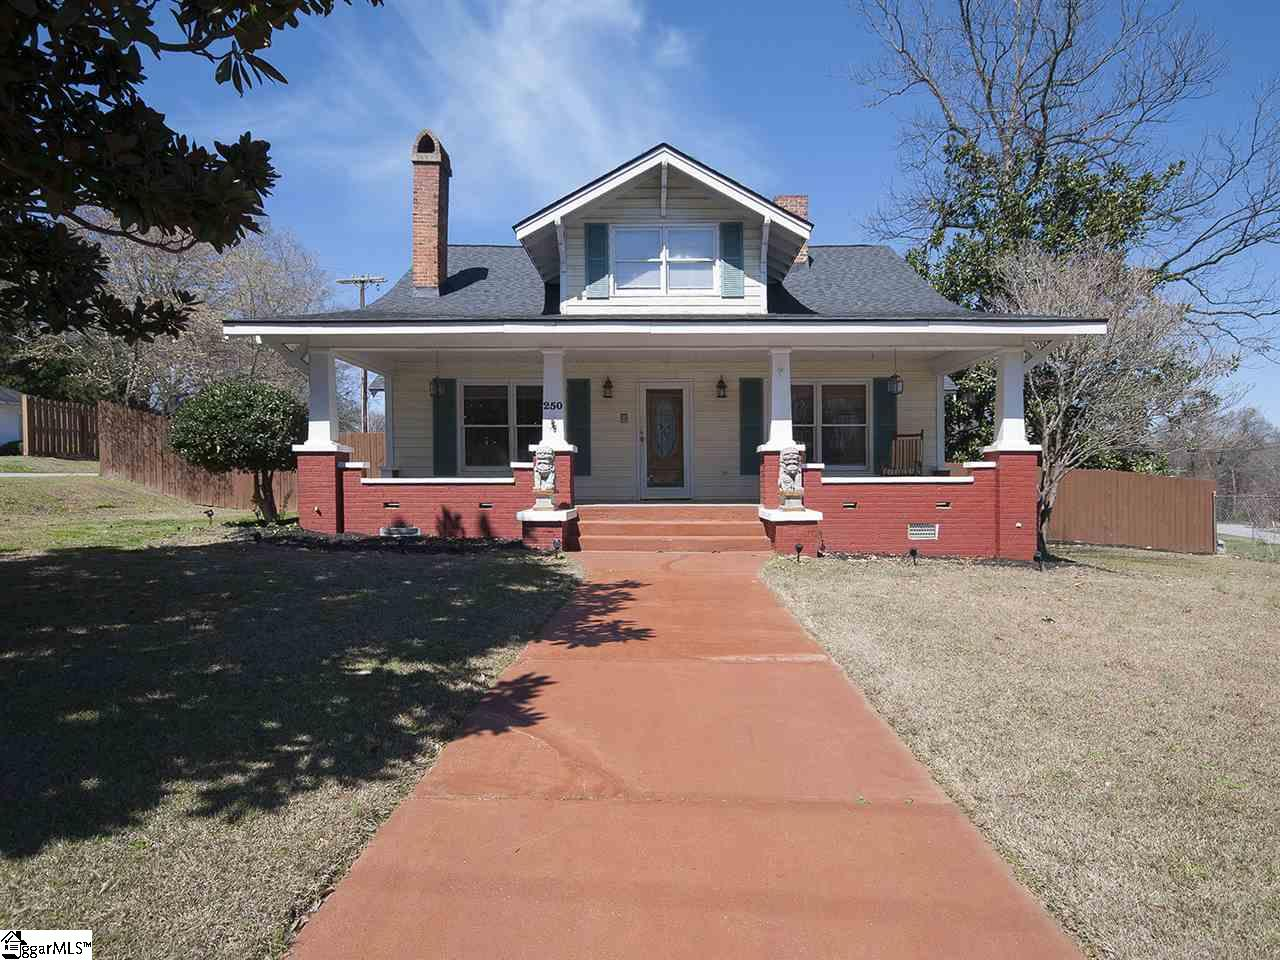 250 E Georgia Street, Woodruff, SC 29388